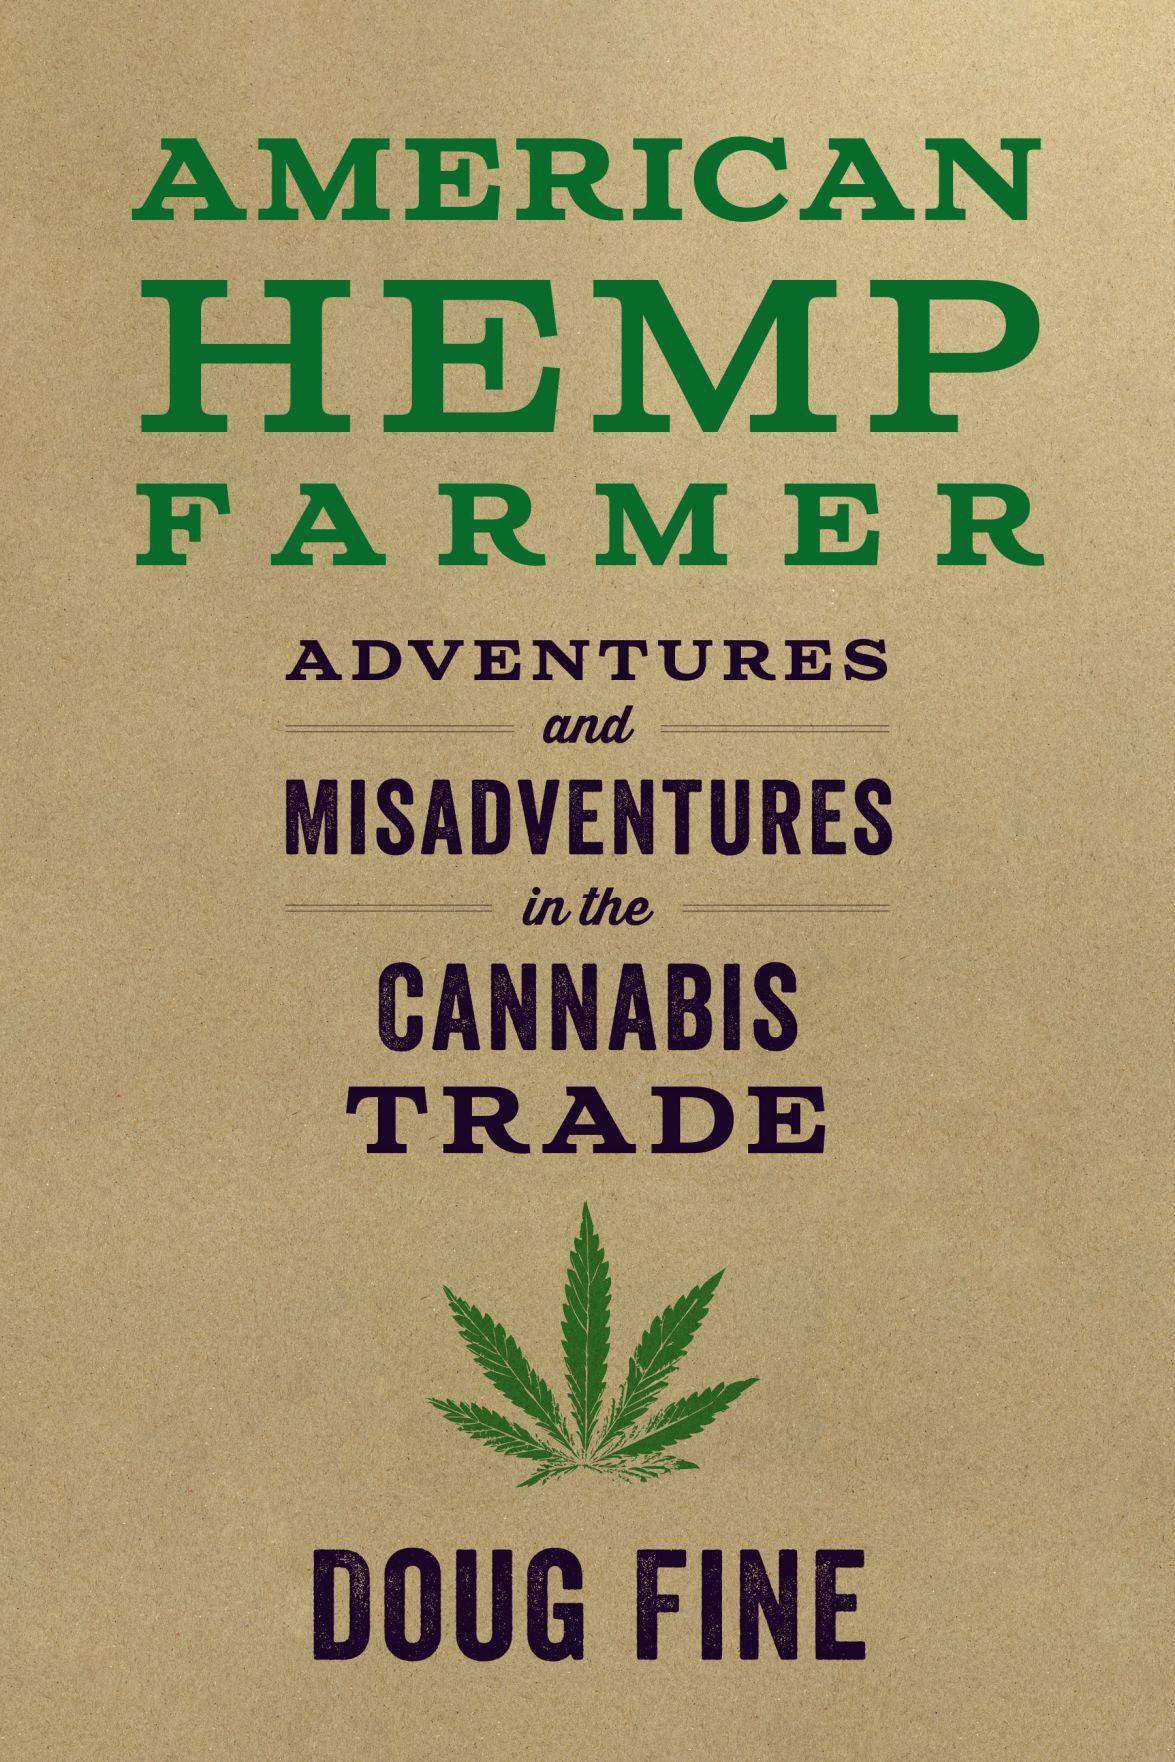 'American Hemp Farmer' cover